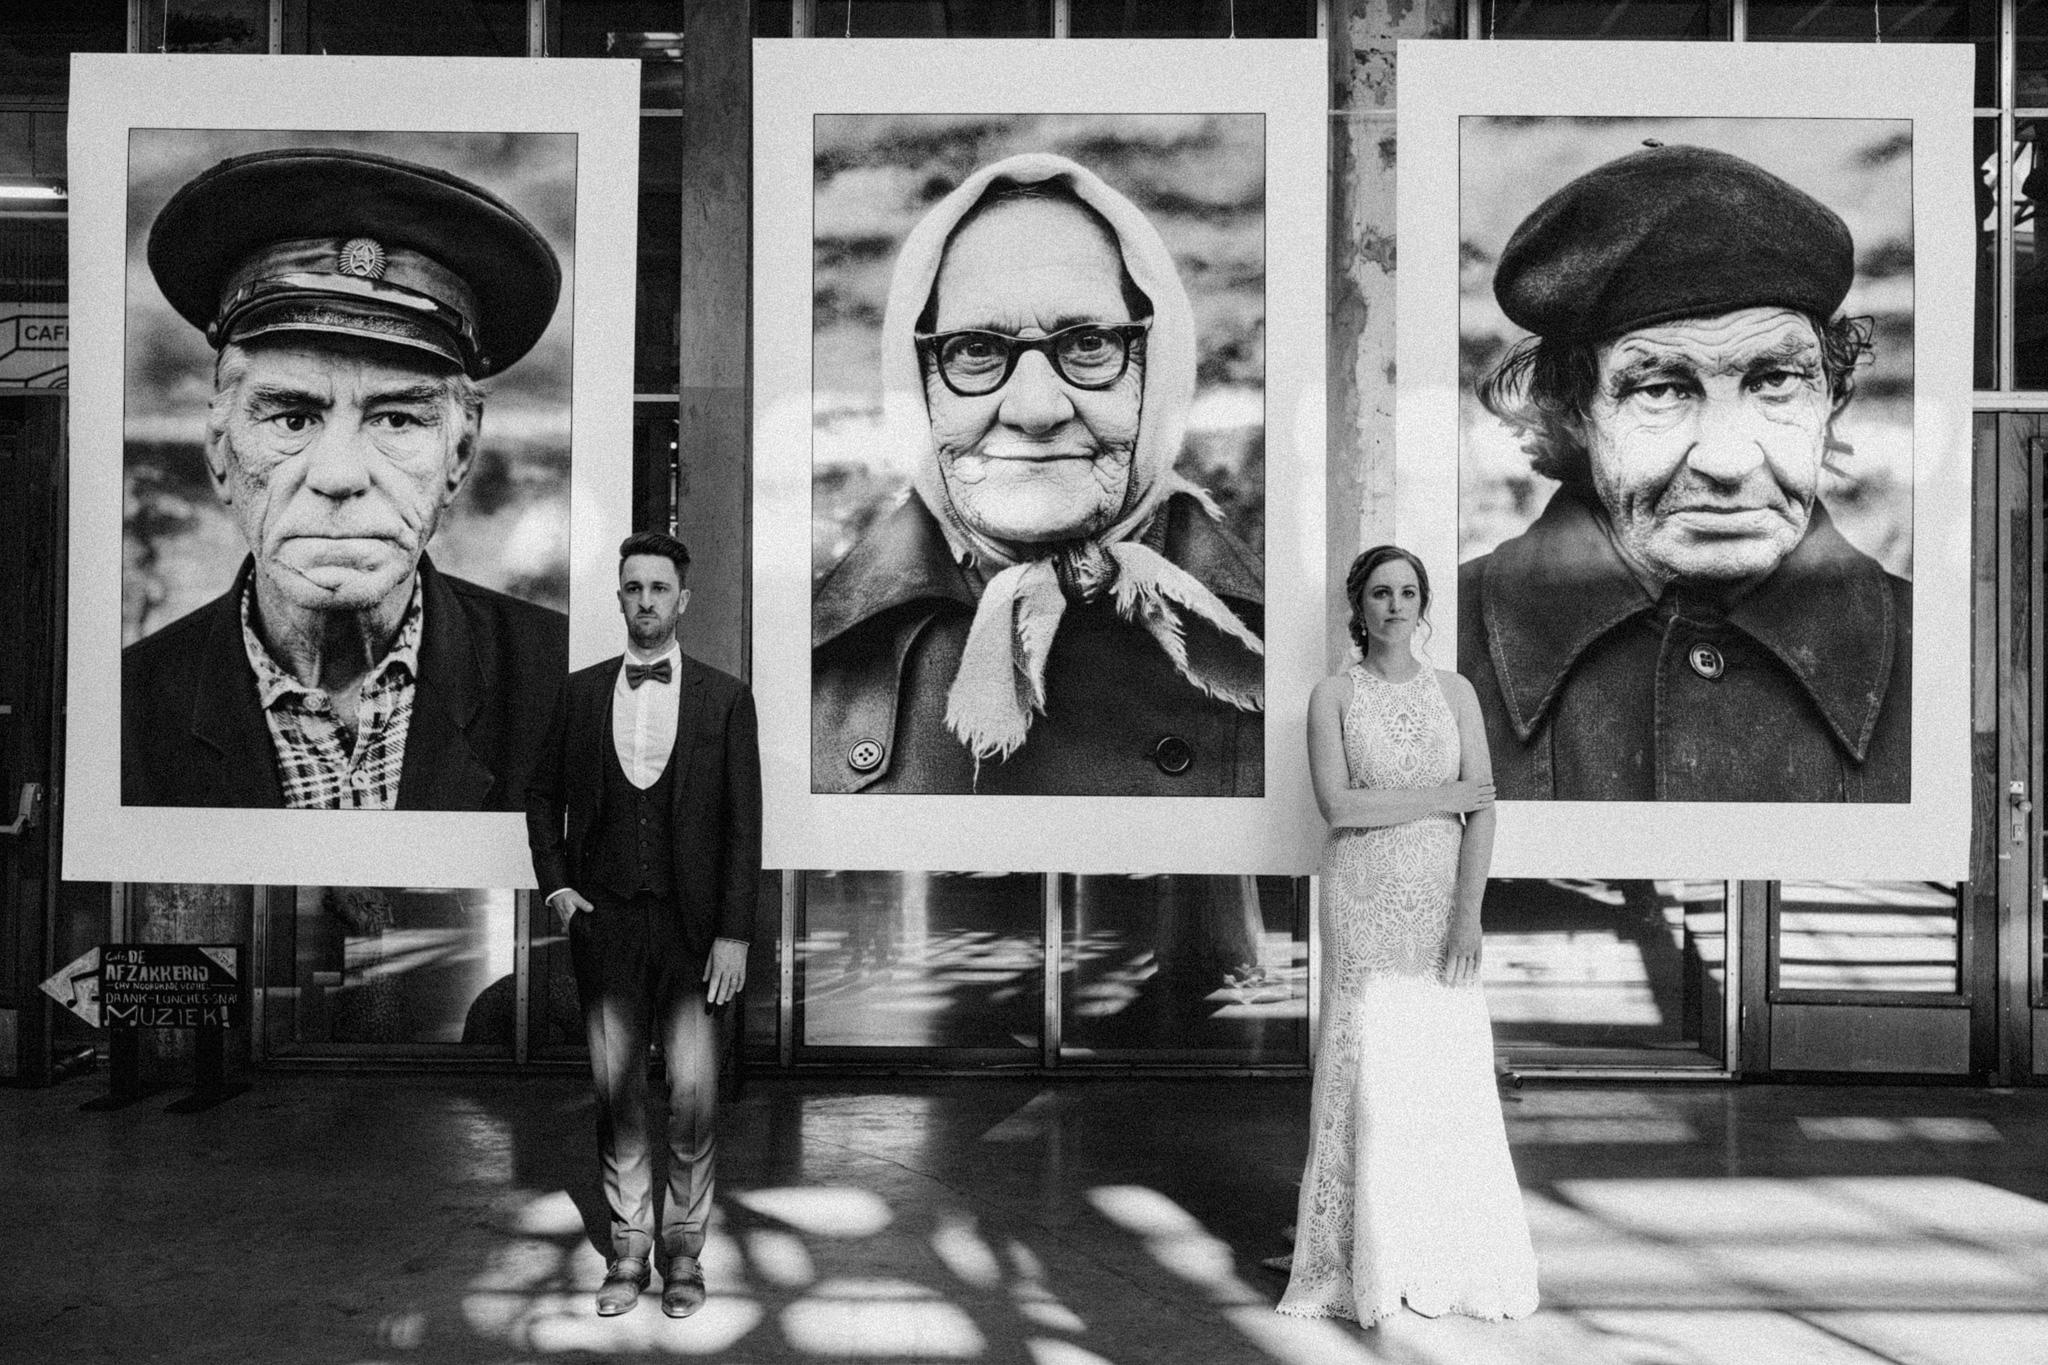 Bruidspaar voor levensgrote fotoprints foto expositie in CHV Noordkade